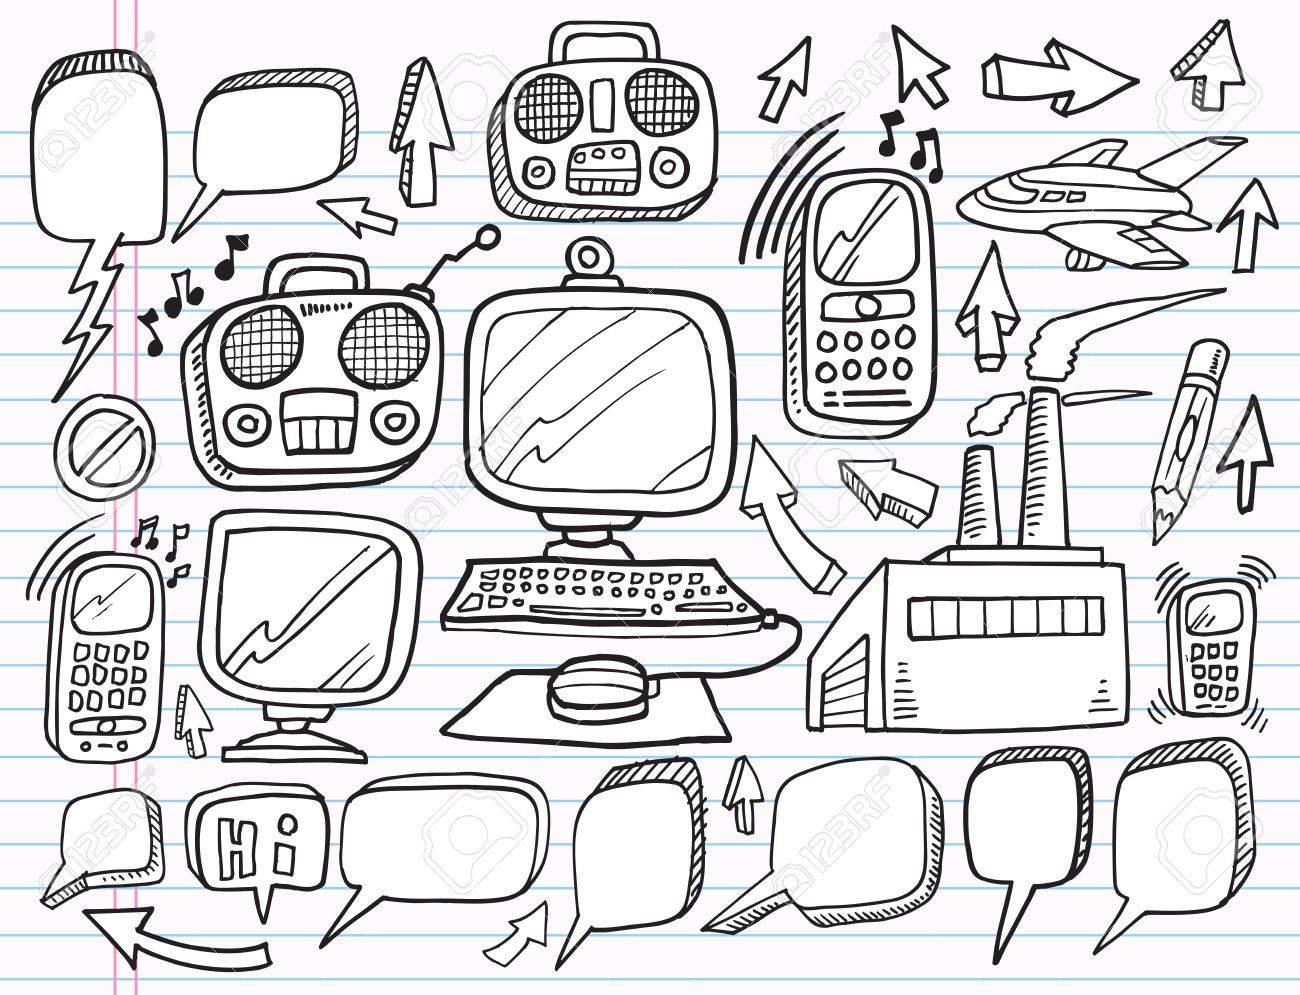 1300x995 Notebook Doodle Electronics Work Business Design Elements Vector